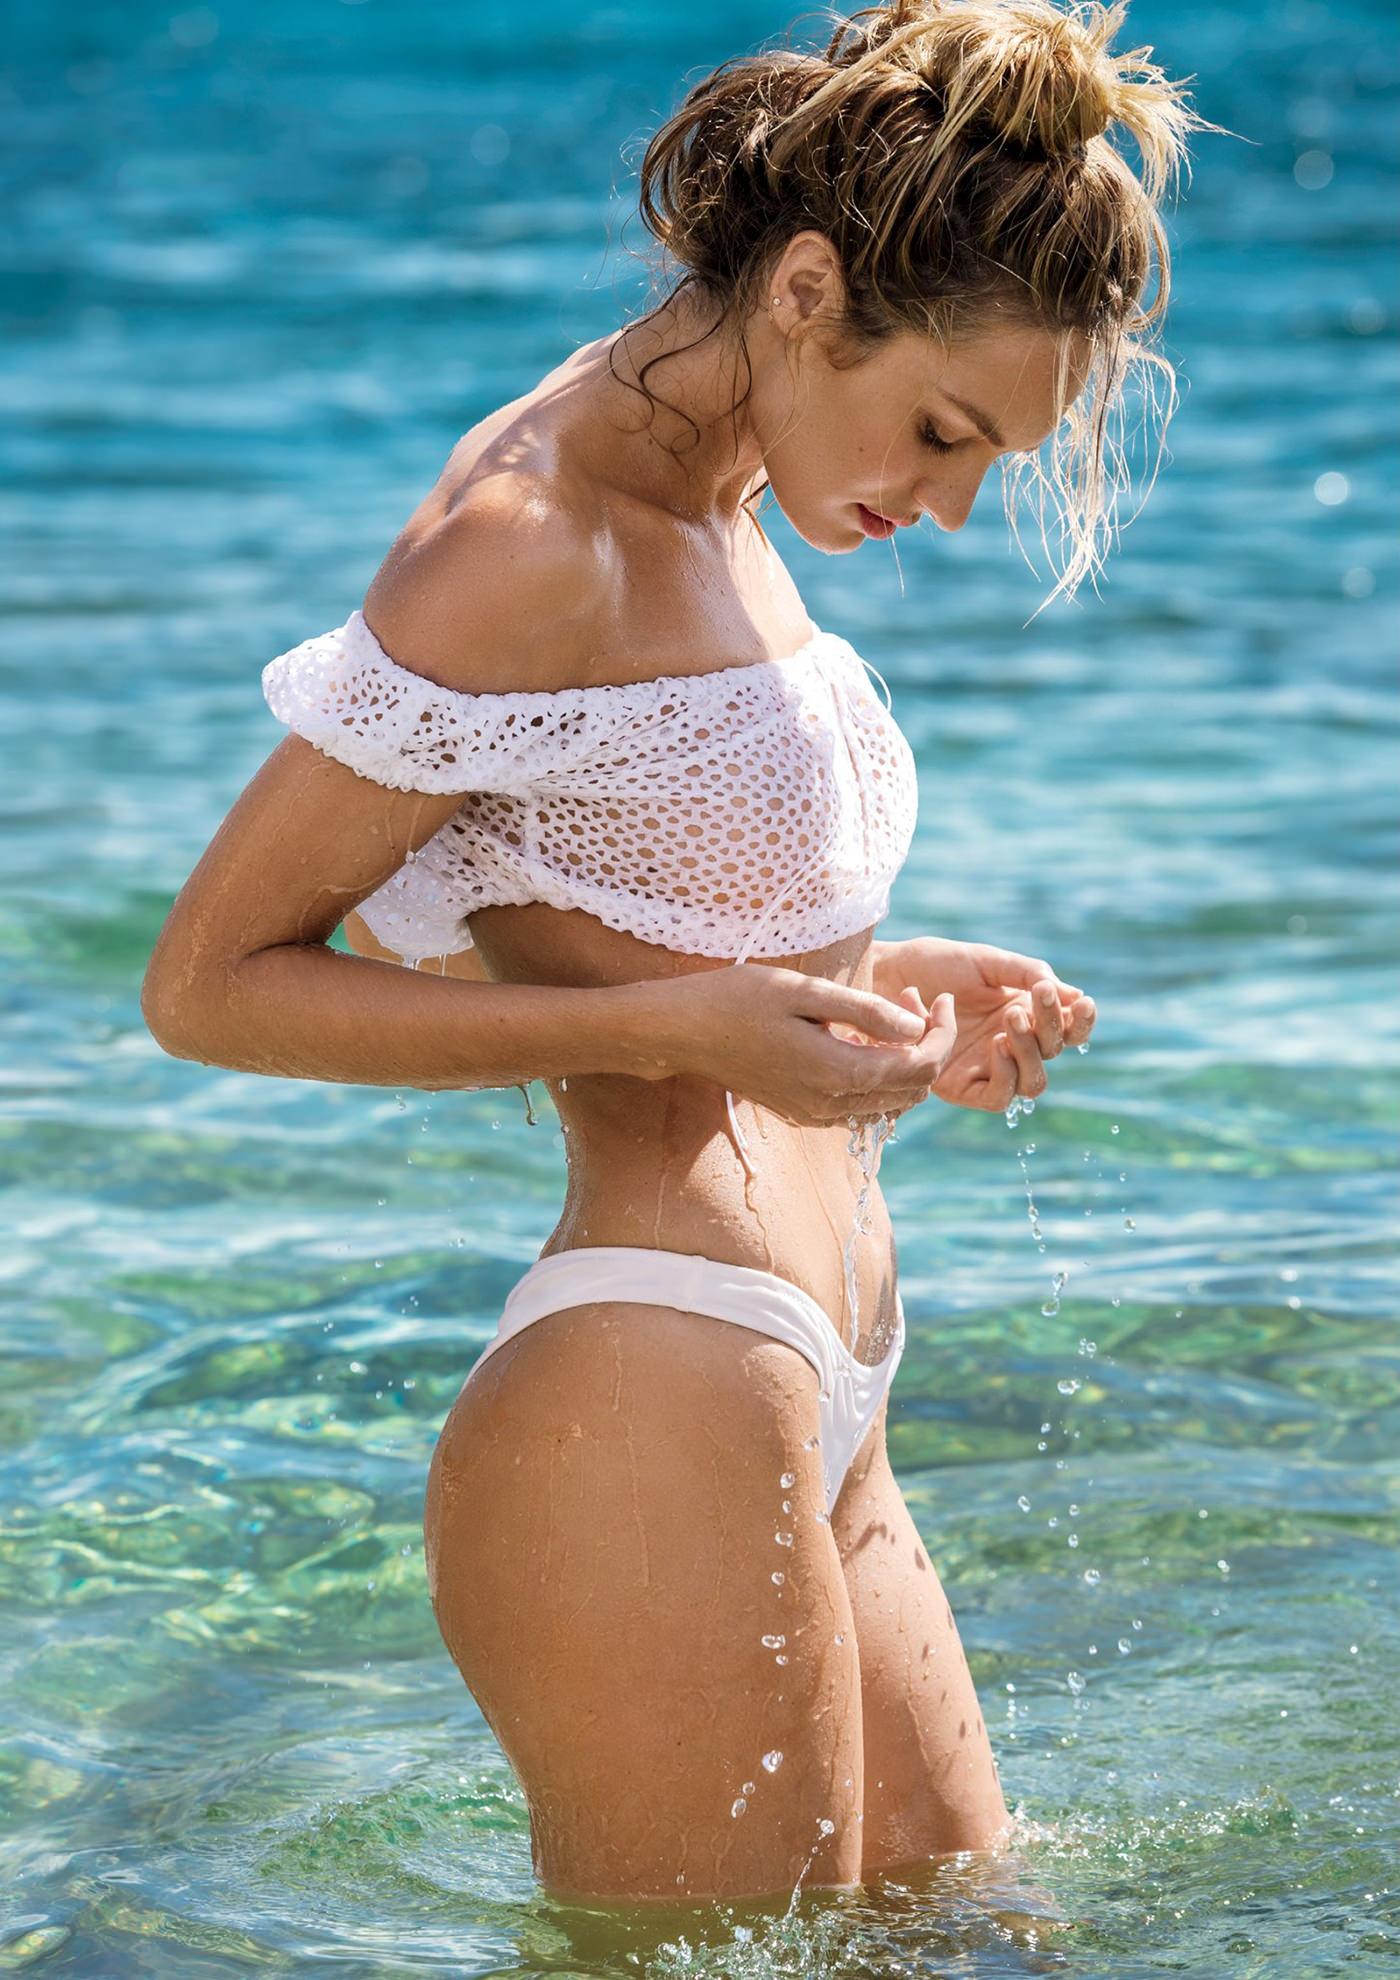 Candice Swanepoel Sexy Ph...